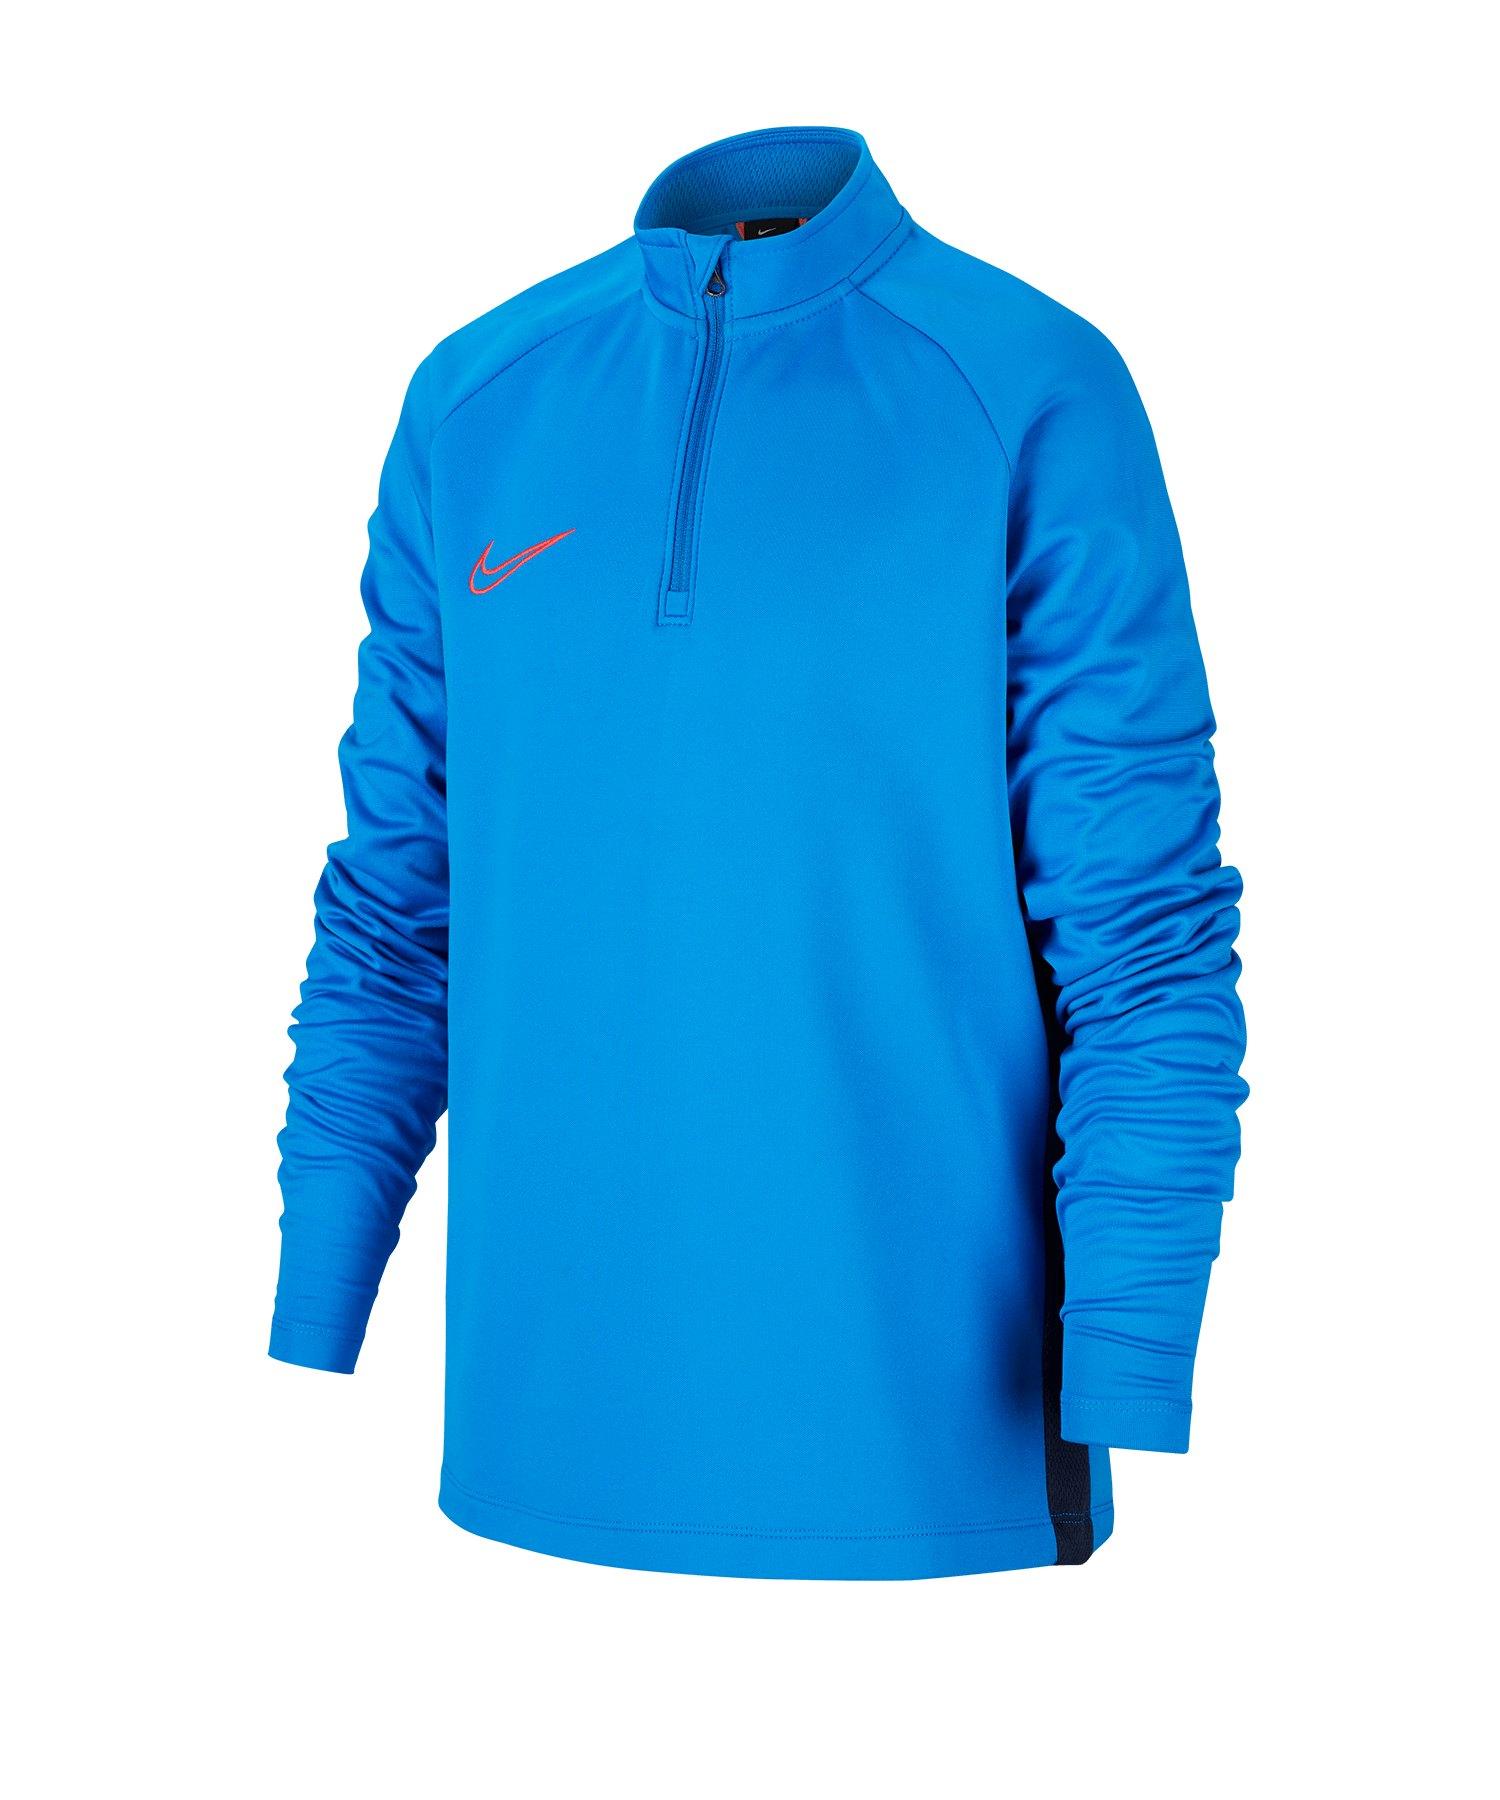 Nike Dry Academy Drill Top Kids Blau F453 - blau